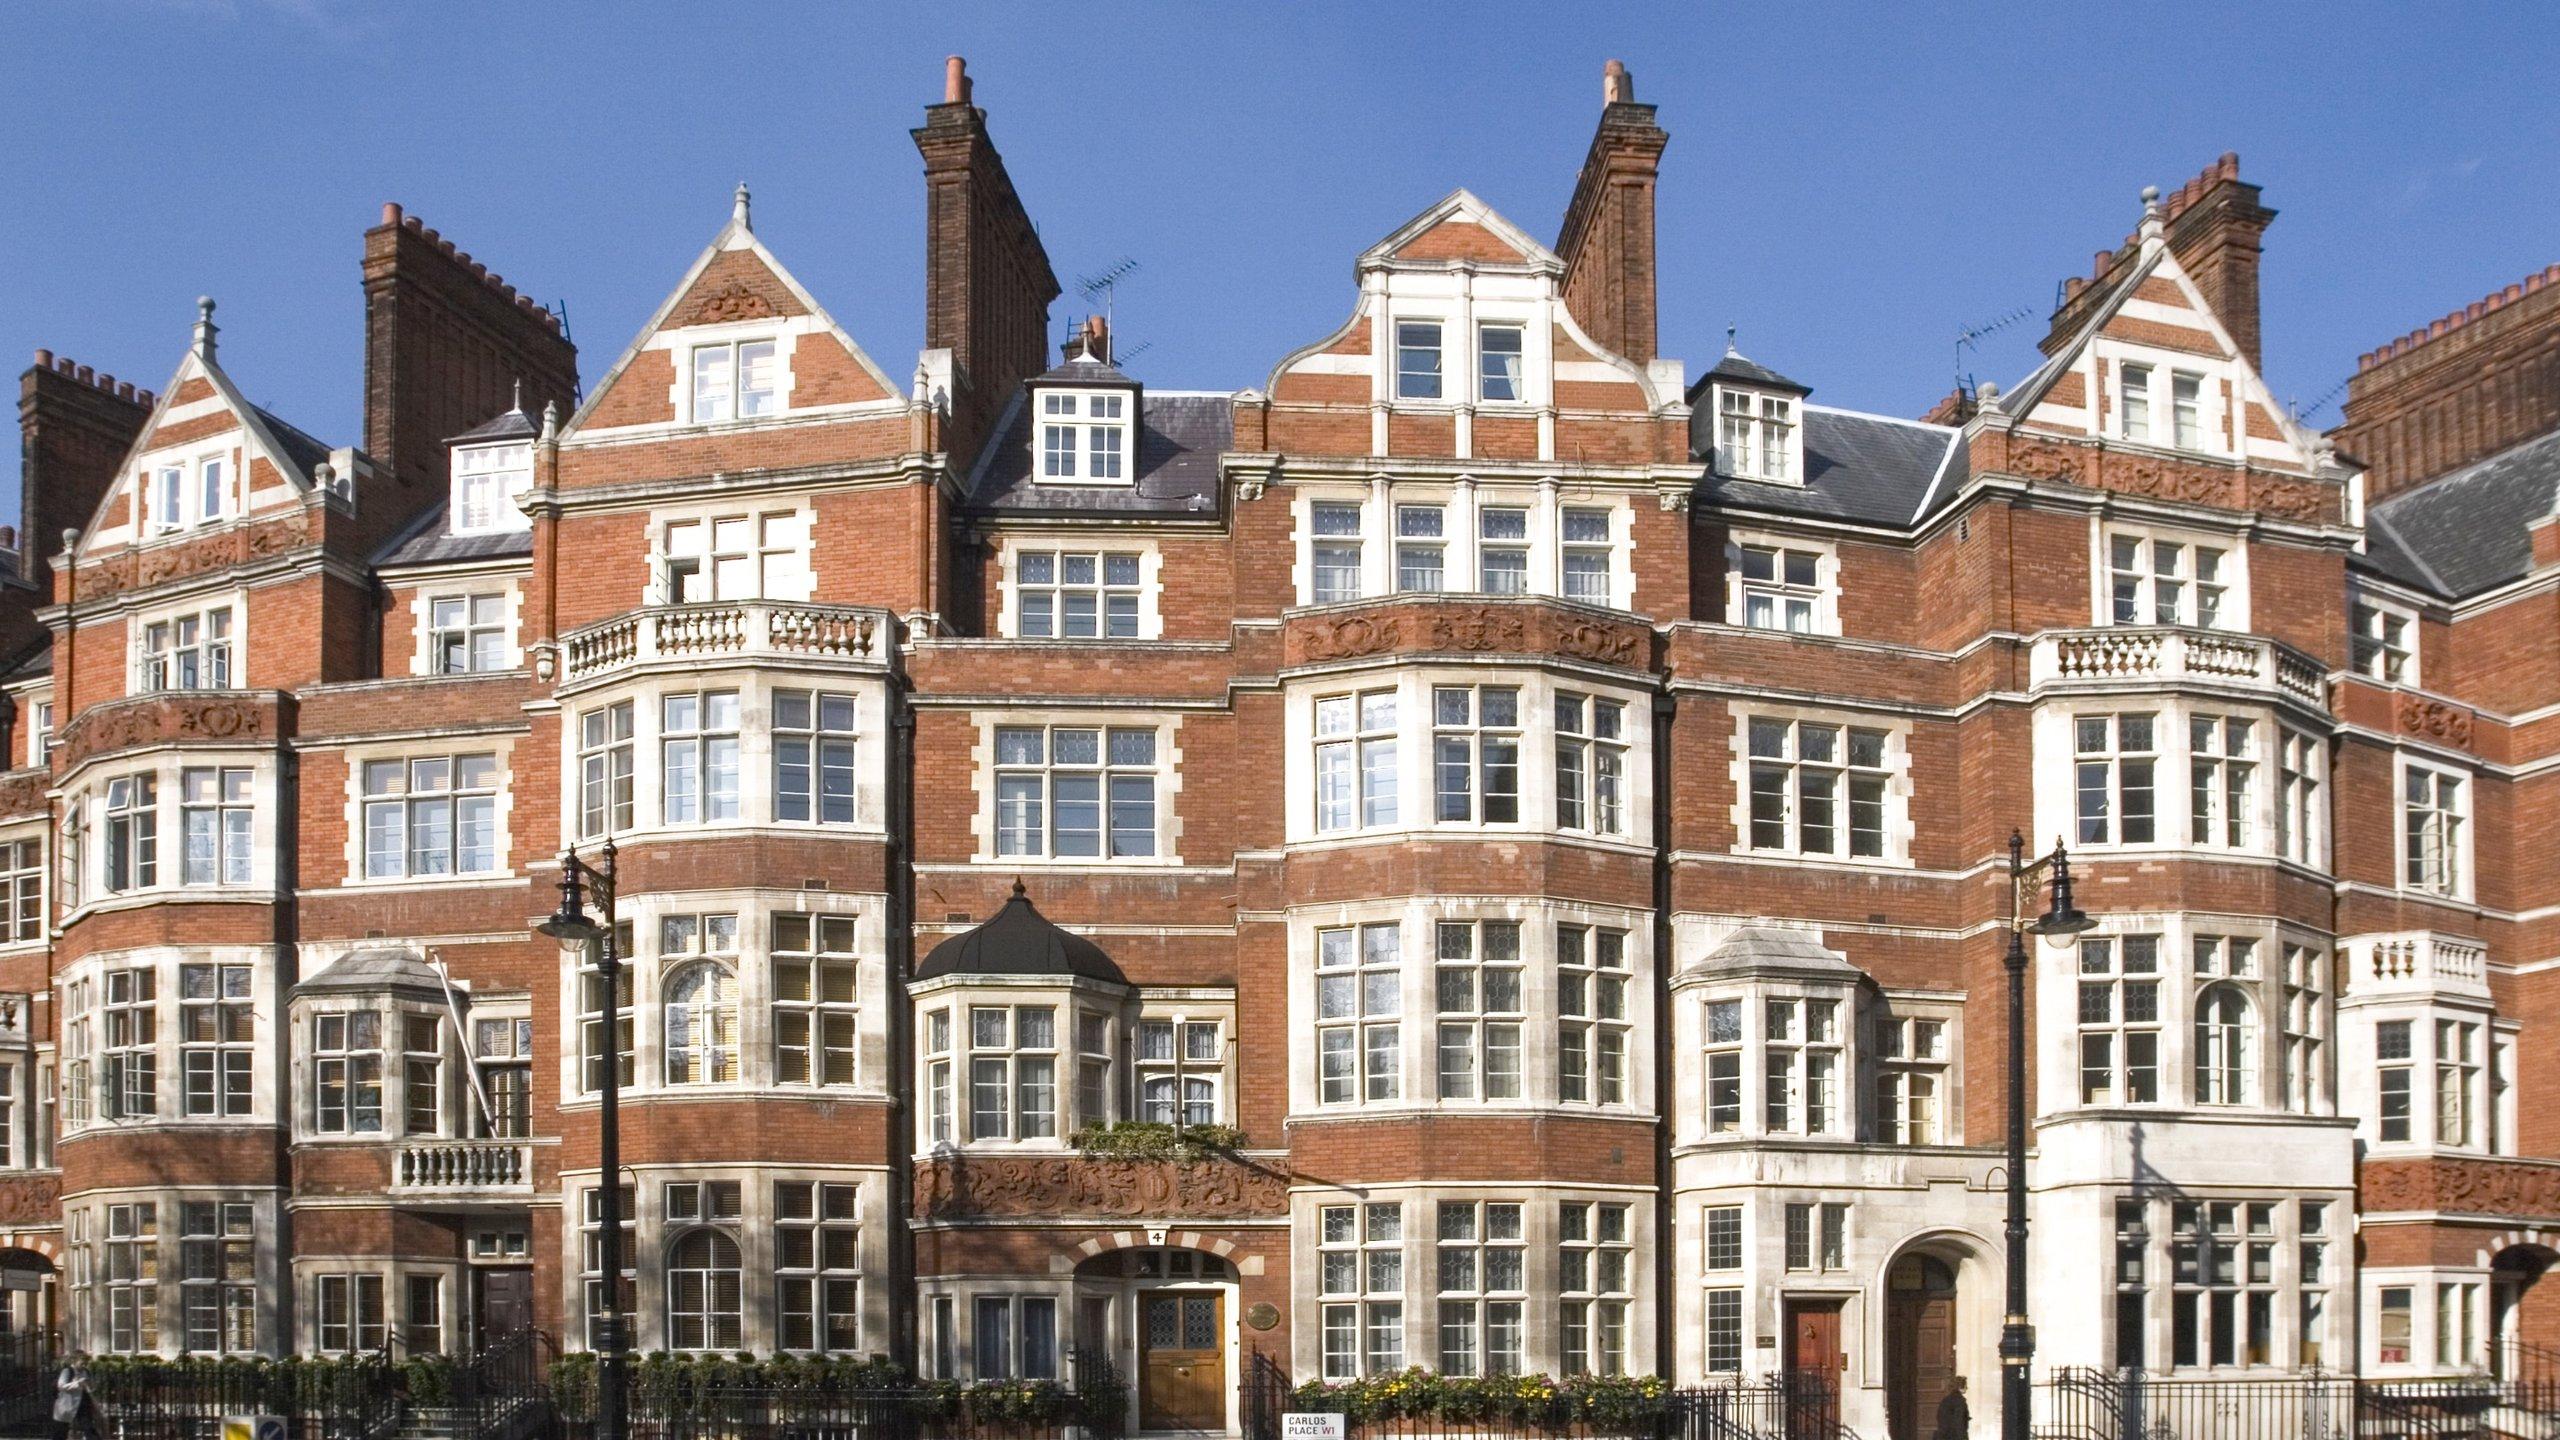 Mayfair, London, England, United Kingdom